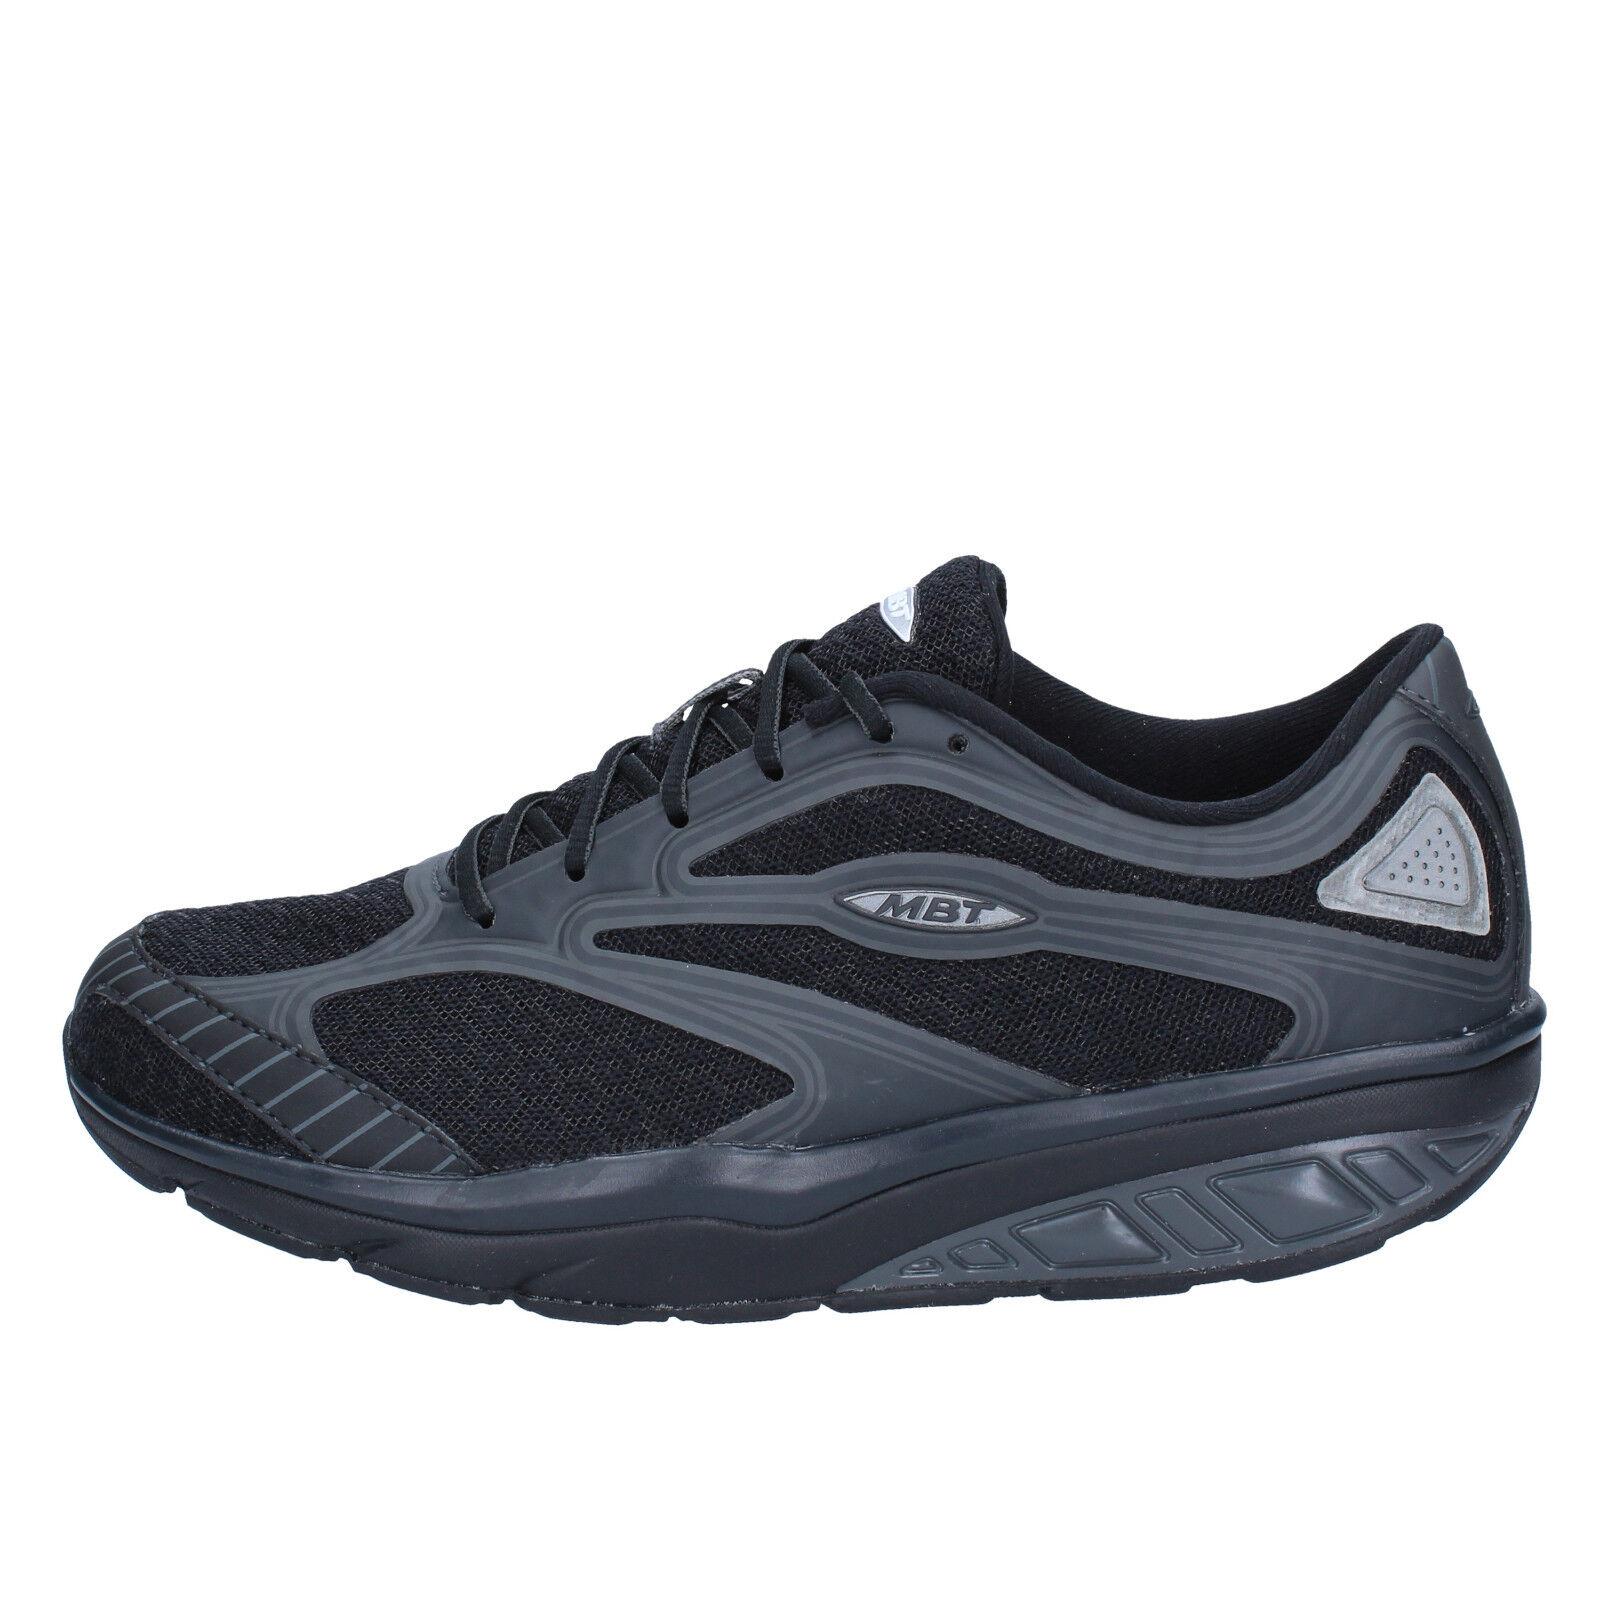 Scarpe donna scarpe da ginnastica MBT 36 EU scarpe da ginnastica donna nero tessuto AB939 C